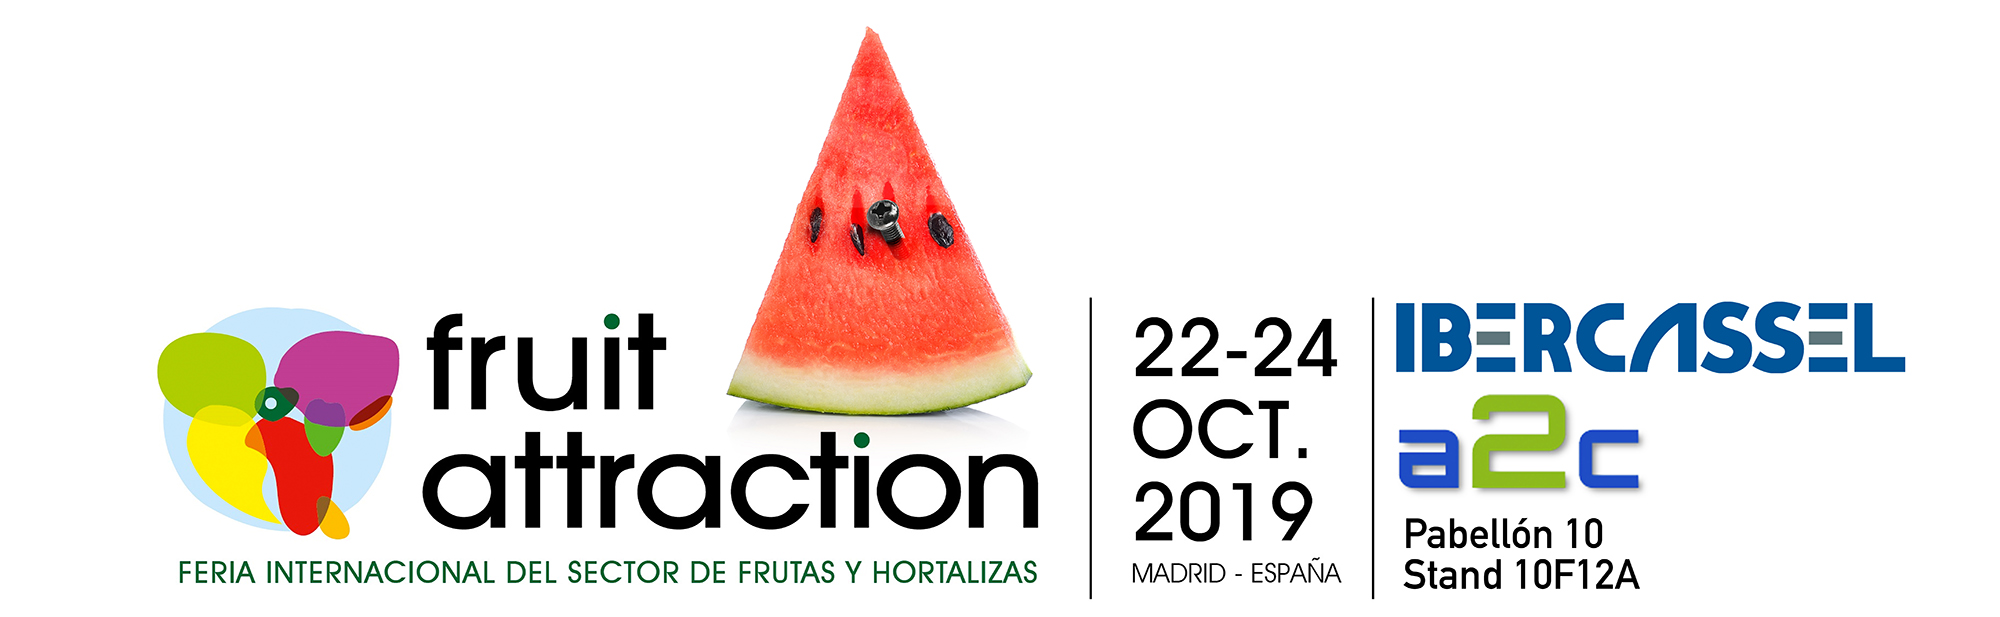 Ibercassel Fruit Attraction 2019